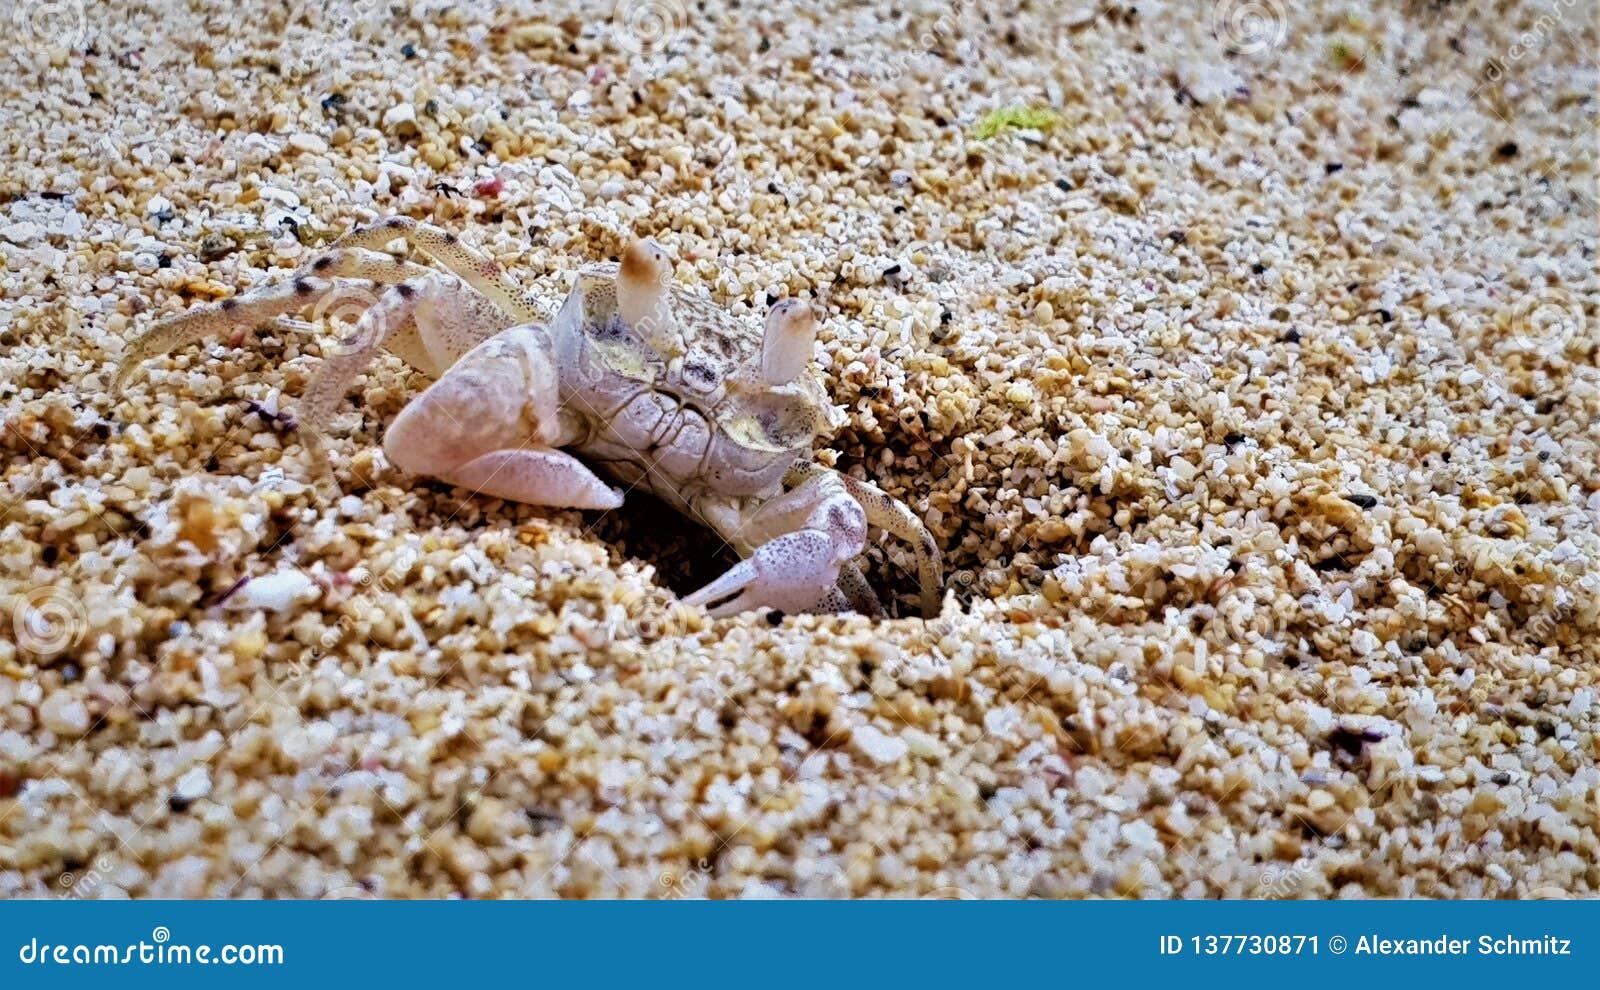 Closeup of crab at beach on mauritius island